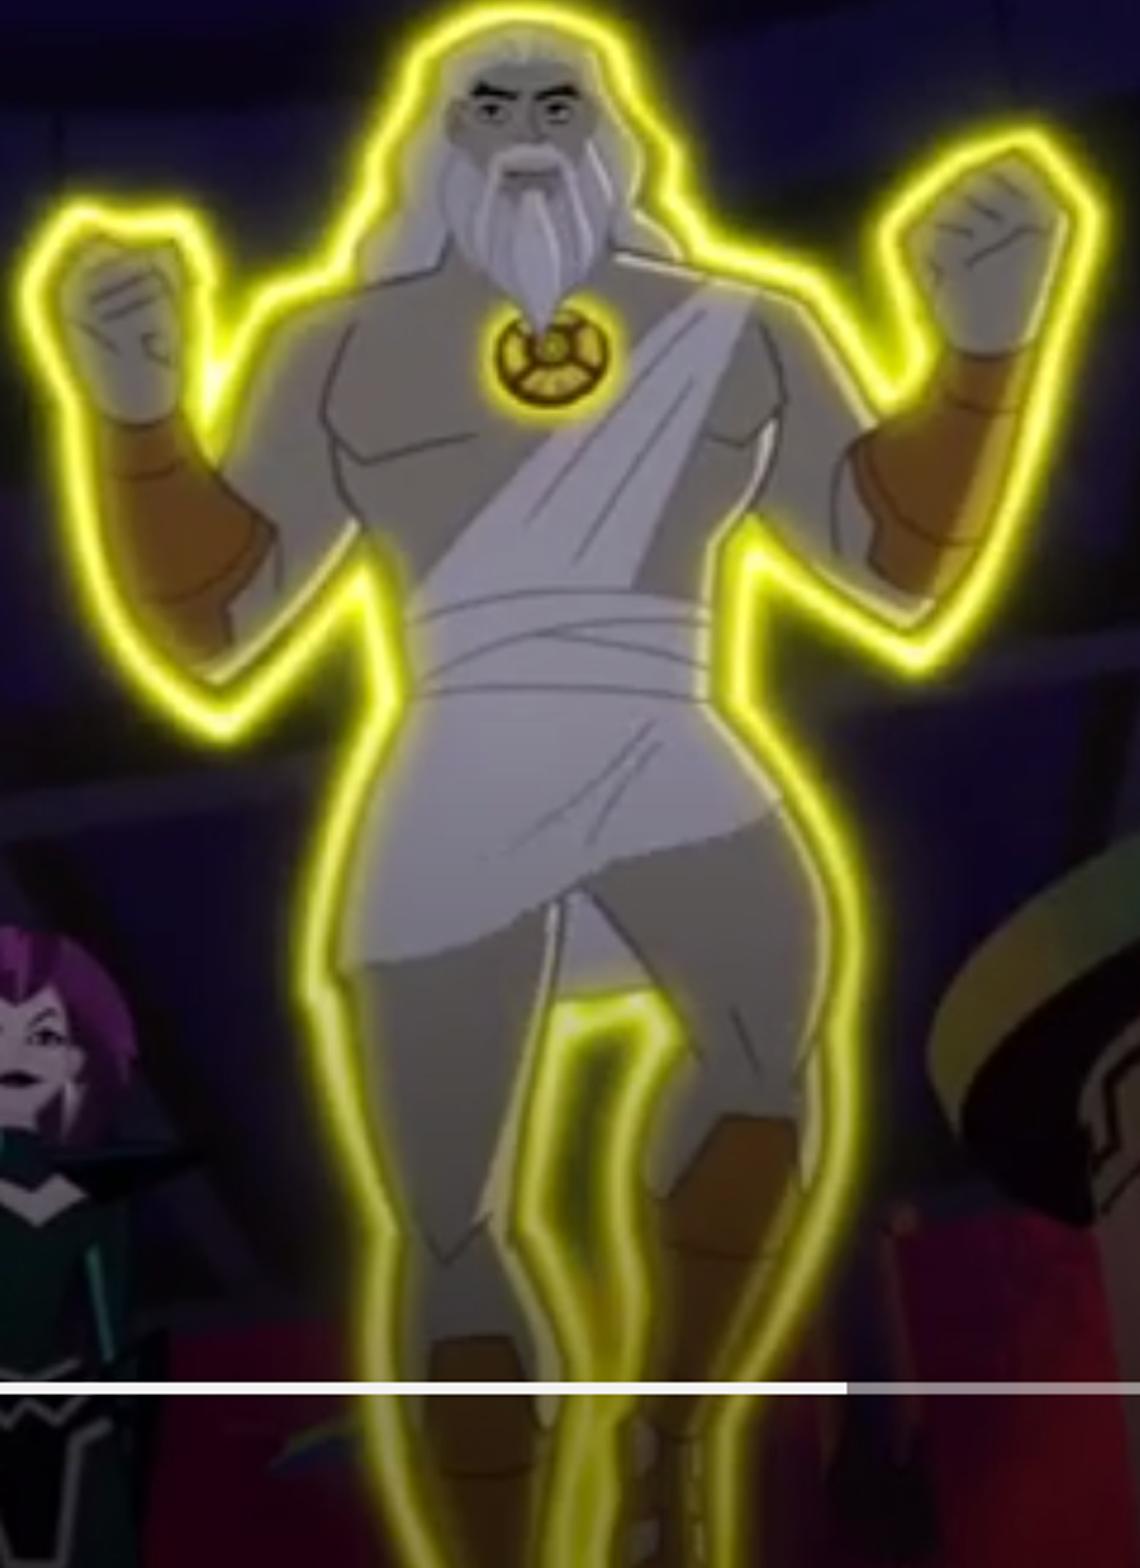 Lex Luthor Zeus Power Aurora Sleeping Beauty Zeus Powers Lex Luthor